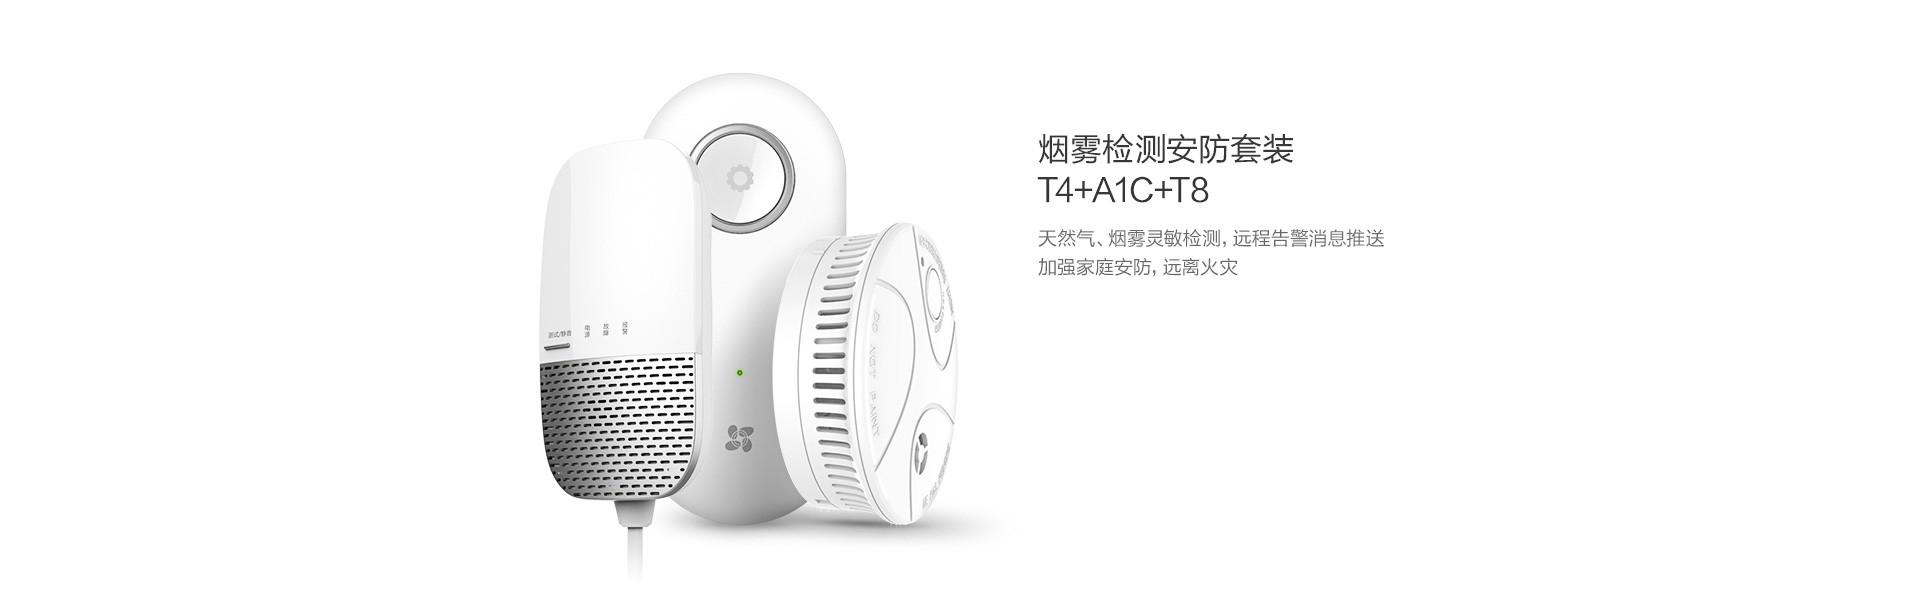 T4+A1C+T8-pc.jpg